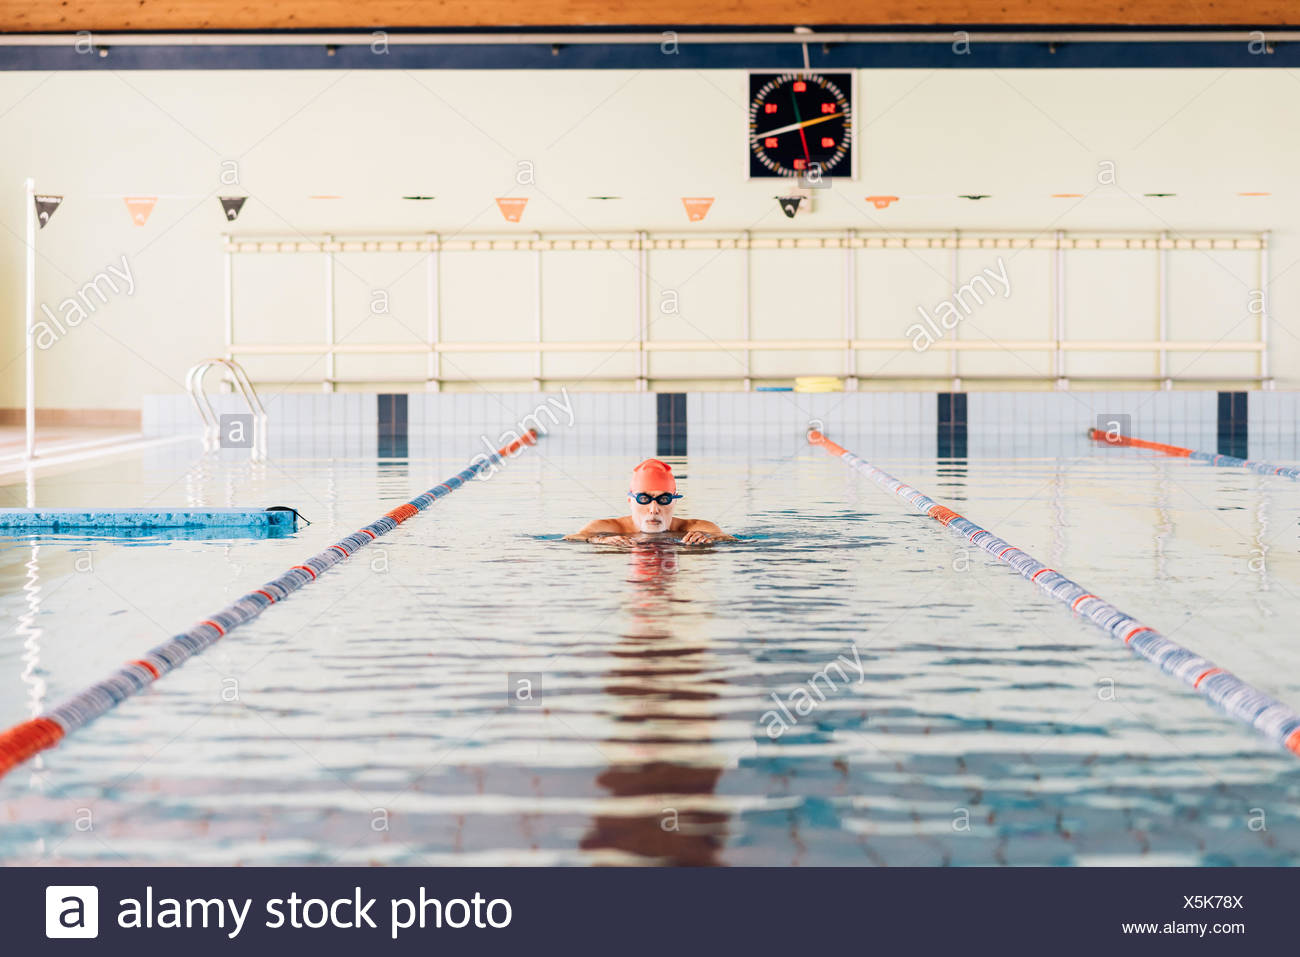 Senior man swimming in pool Photo Stock